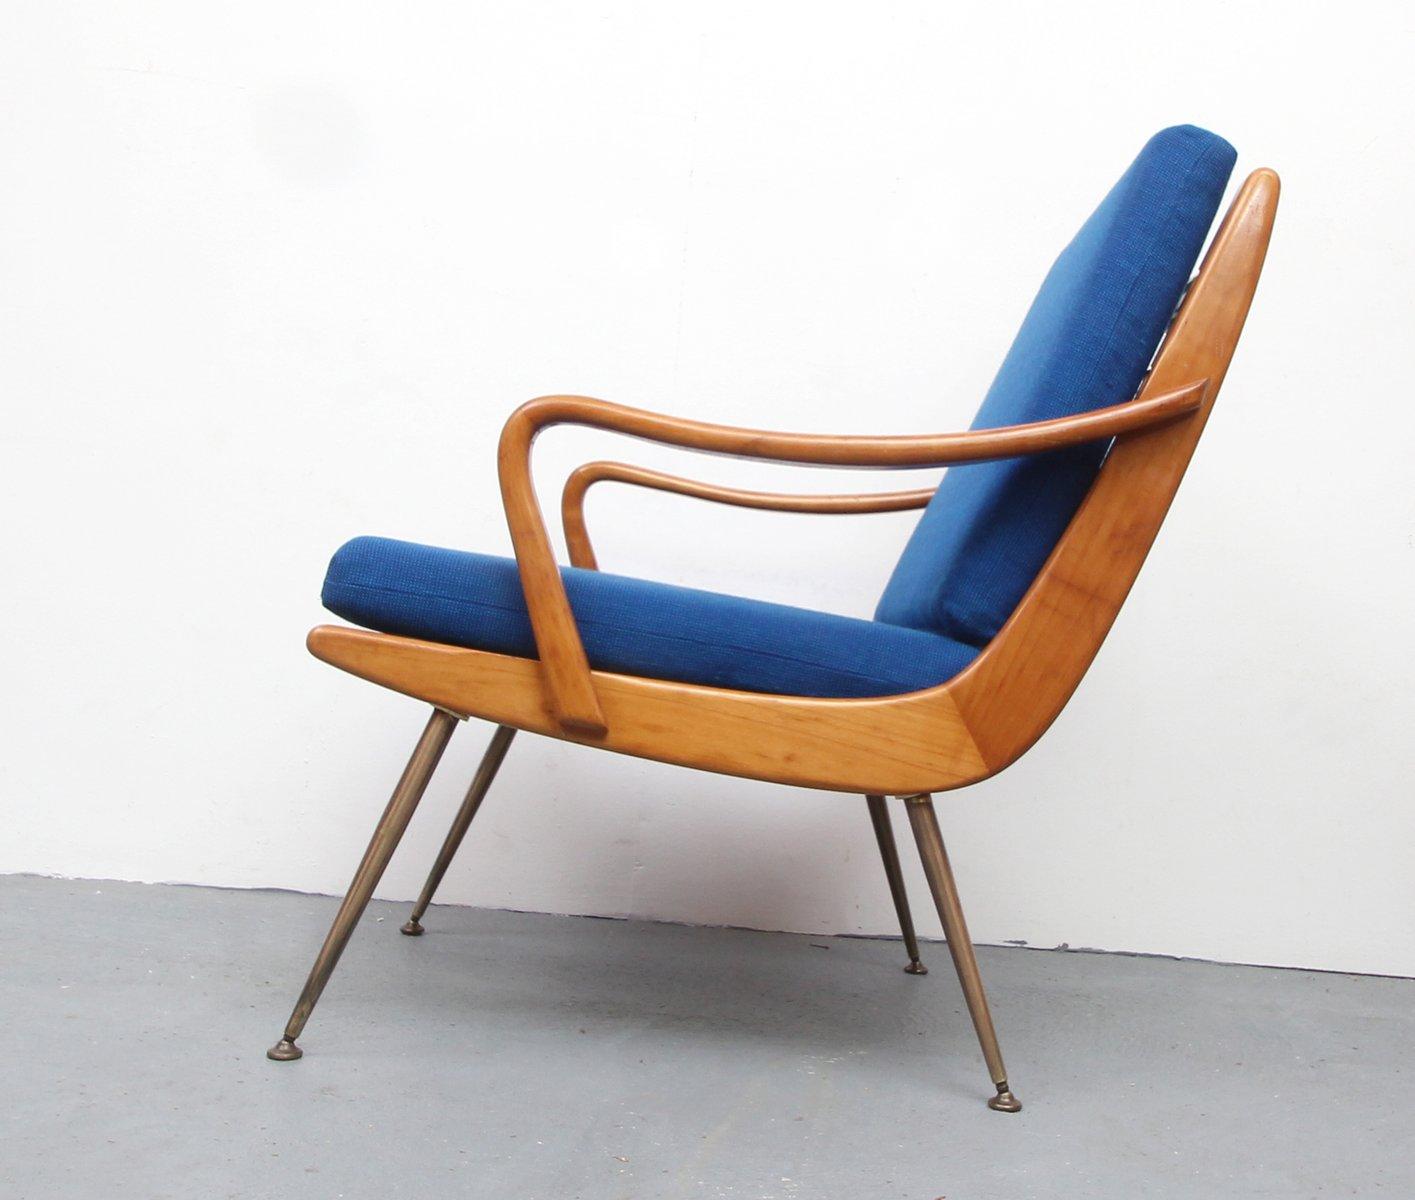 boomerang kirschholz sessel 1950er bei pamono kaufen. Black Bedroom Furniture Sets. Home Design Ideas